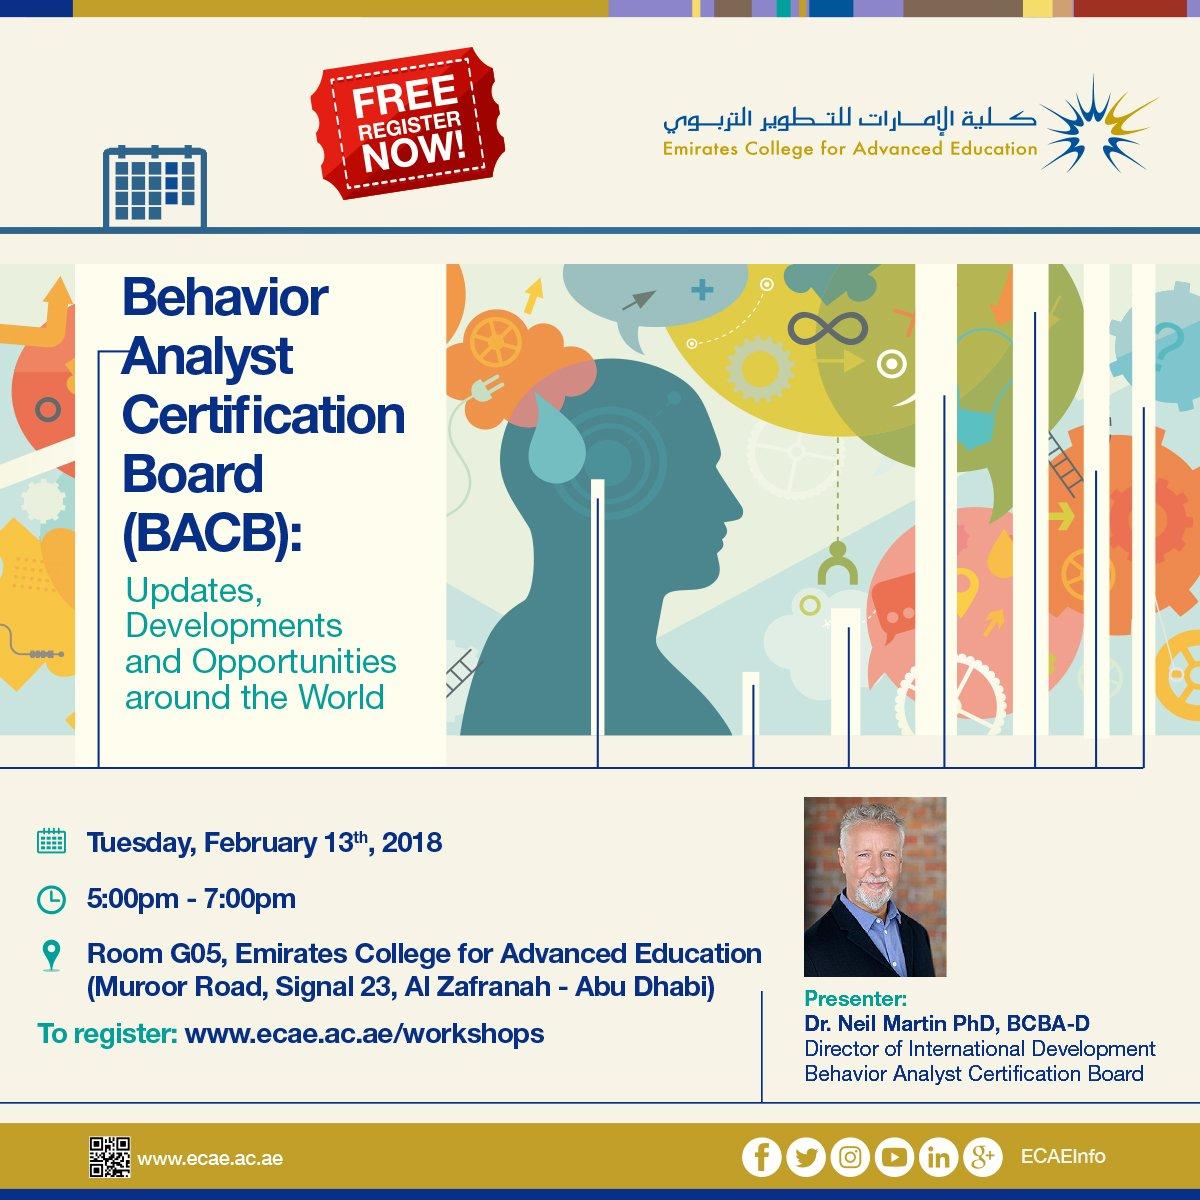 Ecae On Twitter Ecae Organizes A Free Workshop Titled Behavior